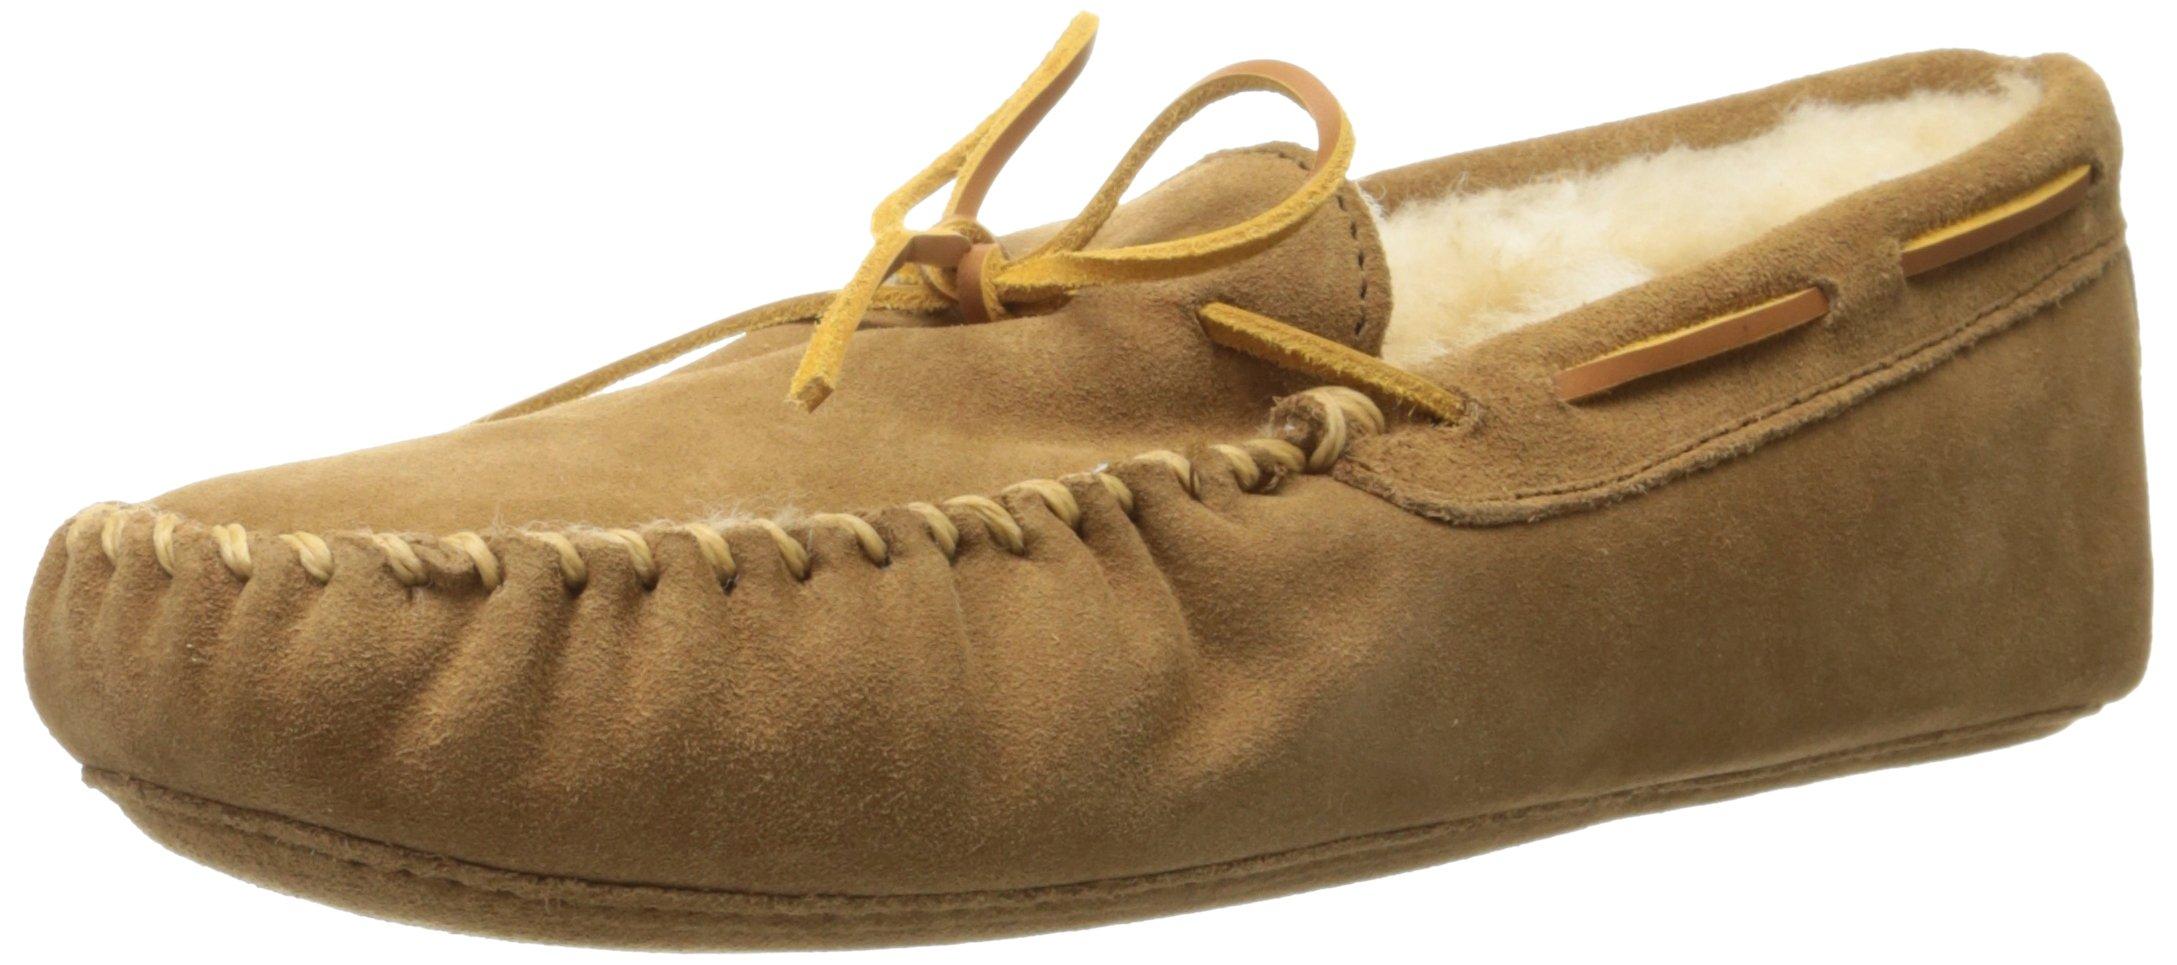 Minnetonka Men's Sheepskin Softsole Moccasin Golden Tan Size 11 US by Minnetonka